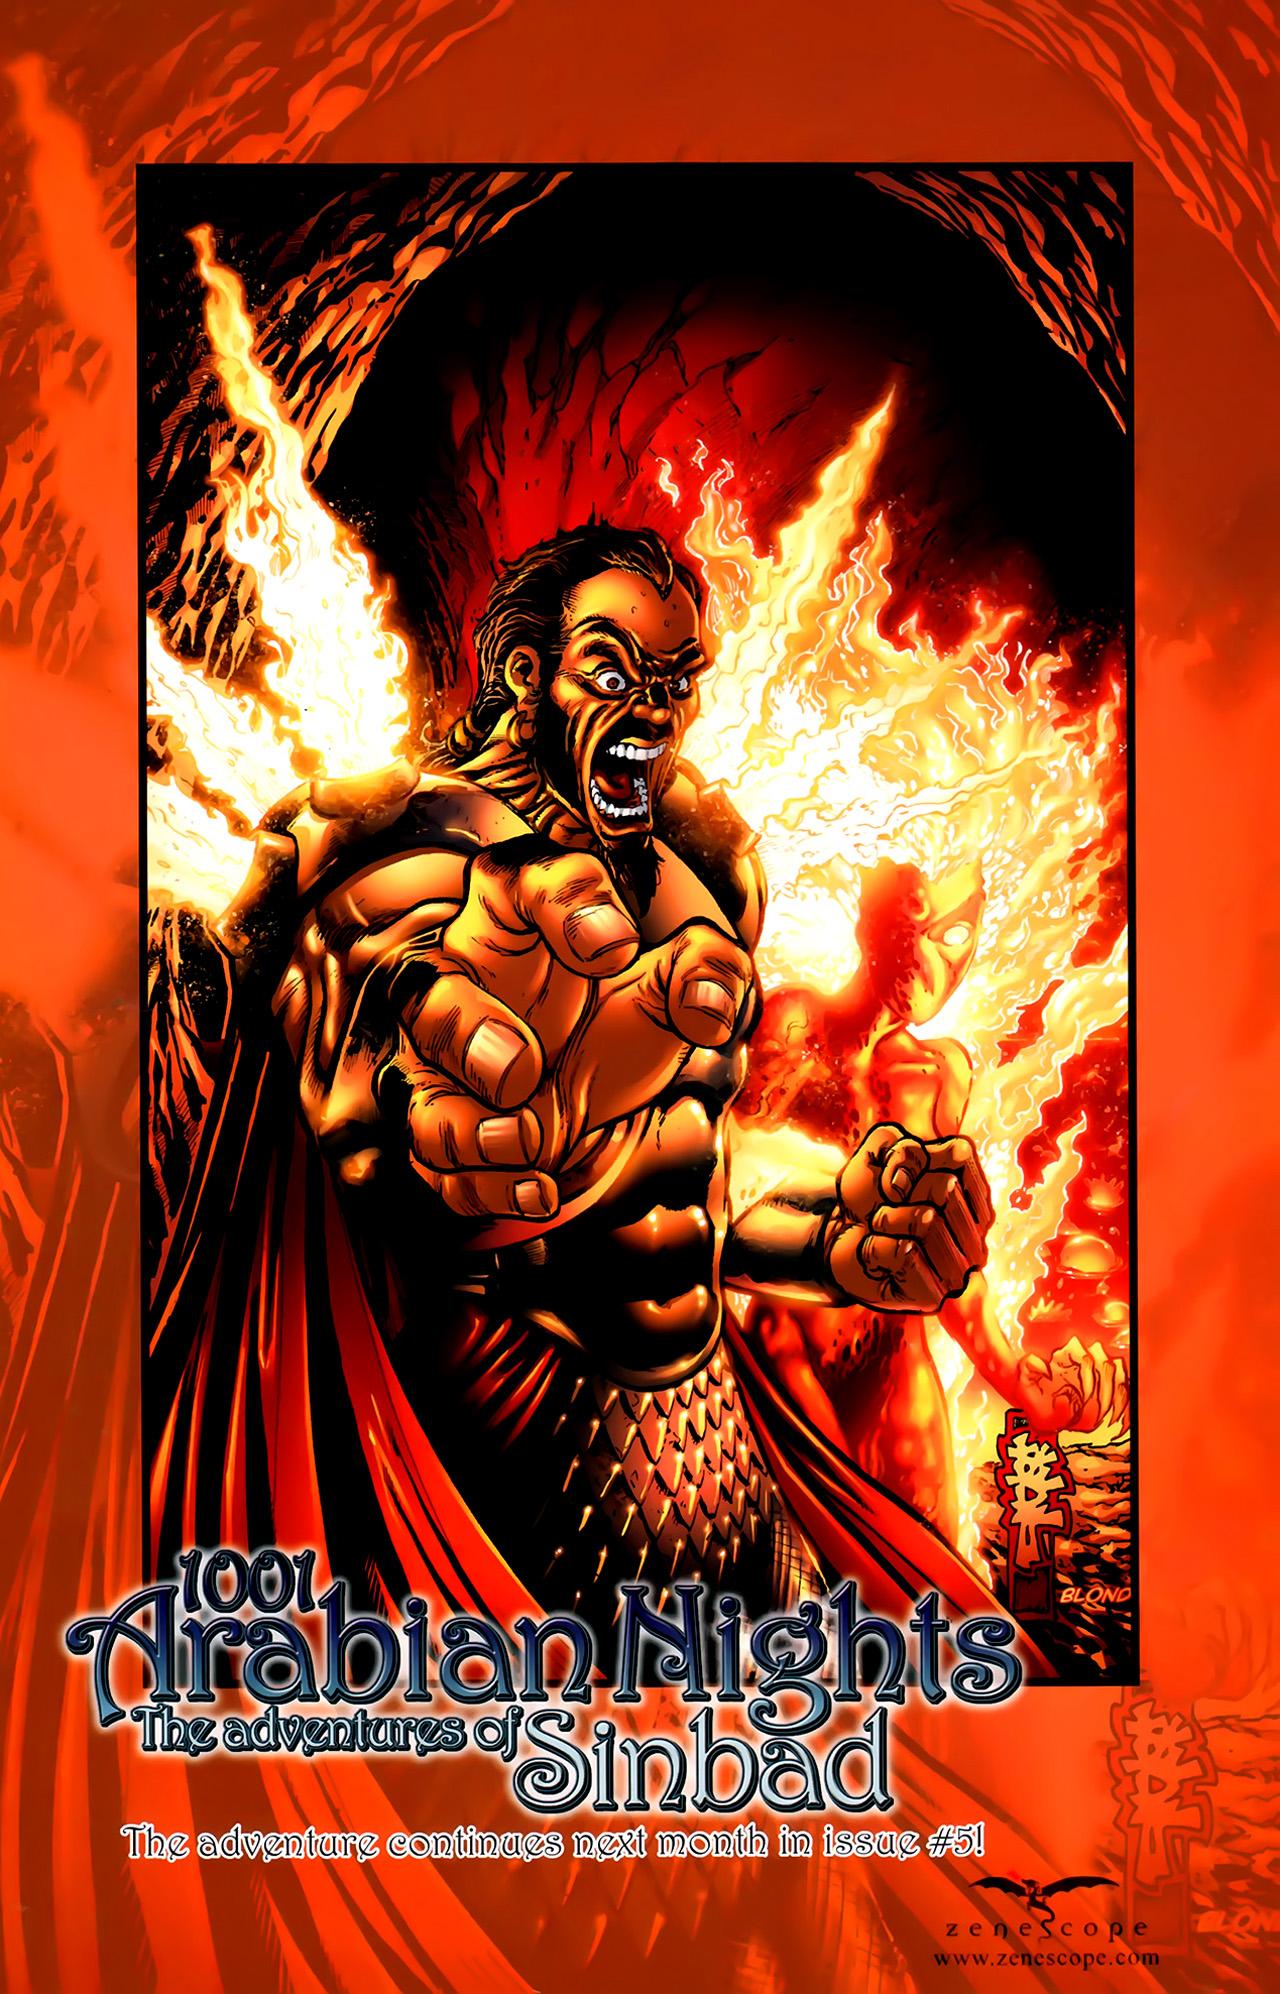 Read online 1001 Arabian Nights: The Adventures of Sinbad comic -  Issue #4 - 28